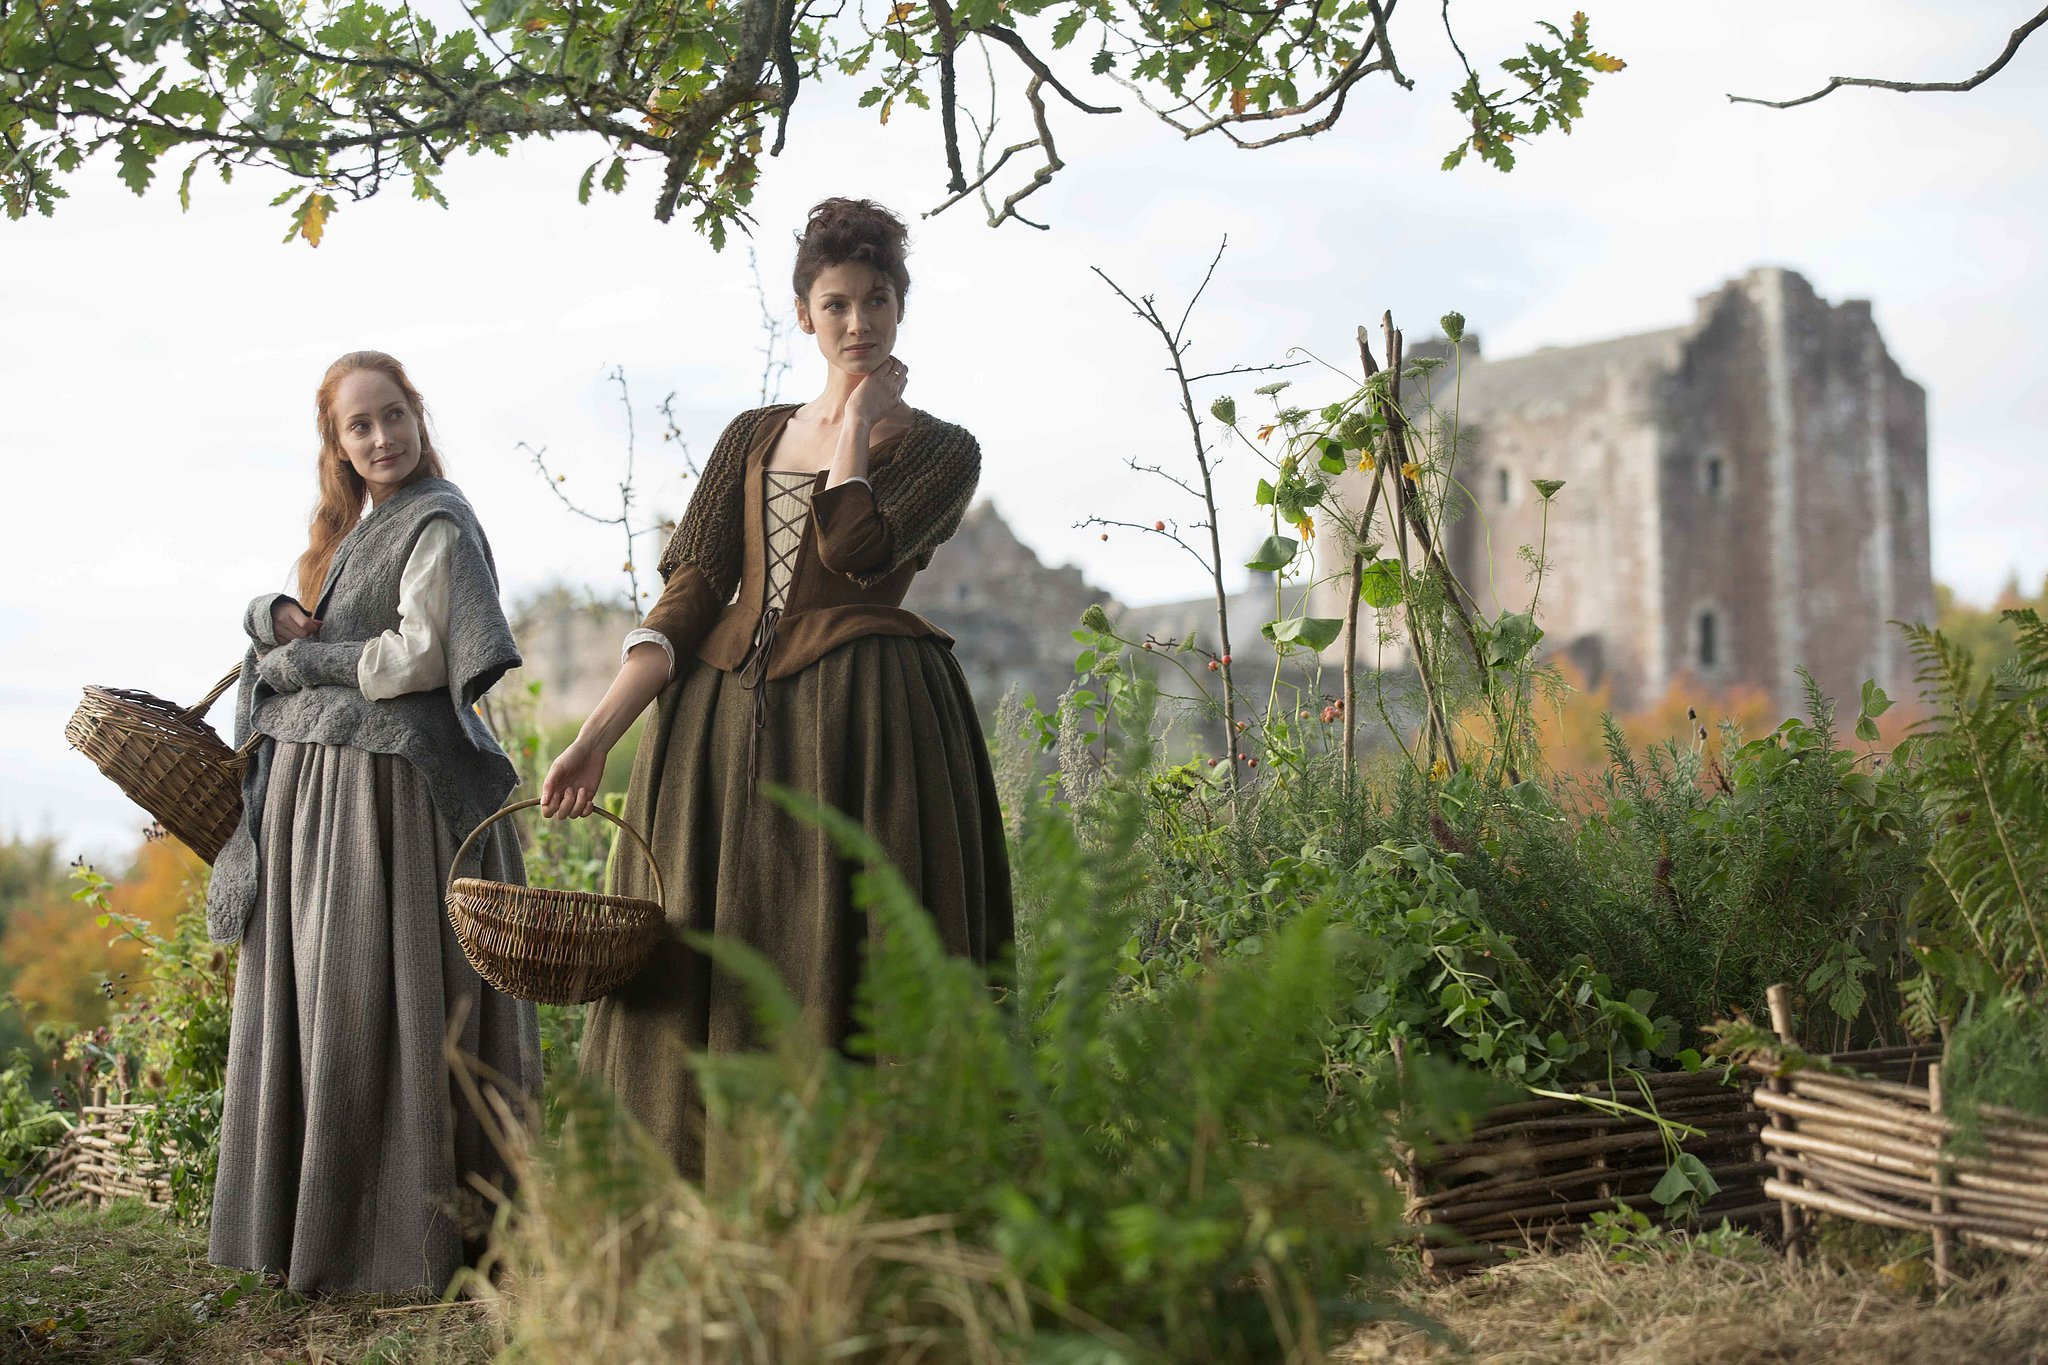 Claire and her newfound friend Geillis gather herbs. Courtesy of Starz